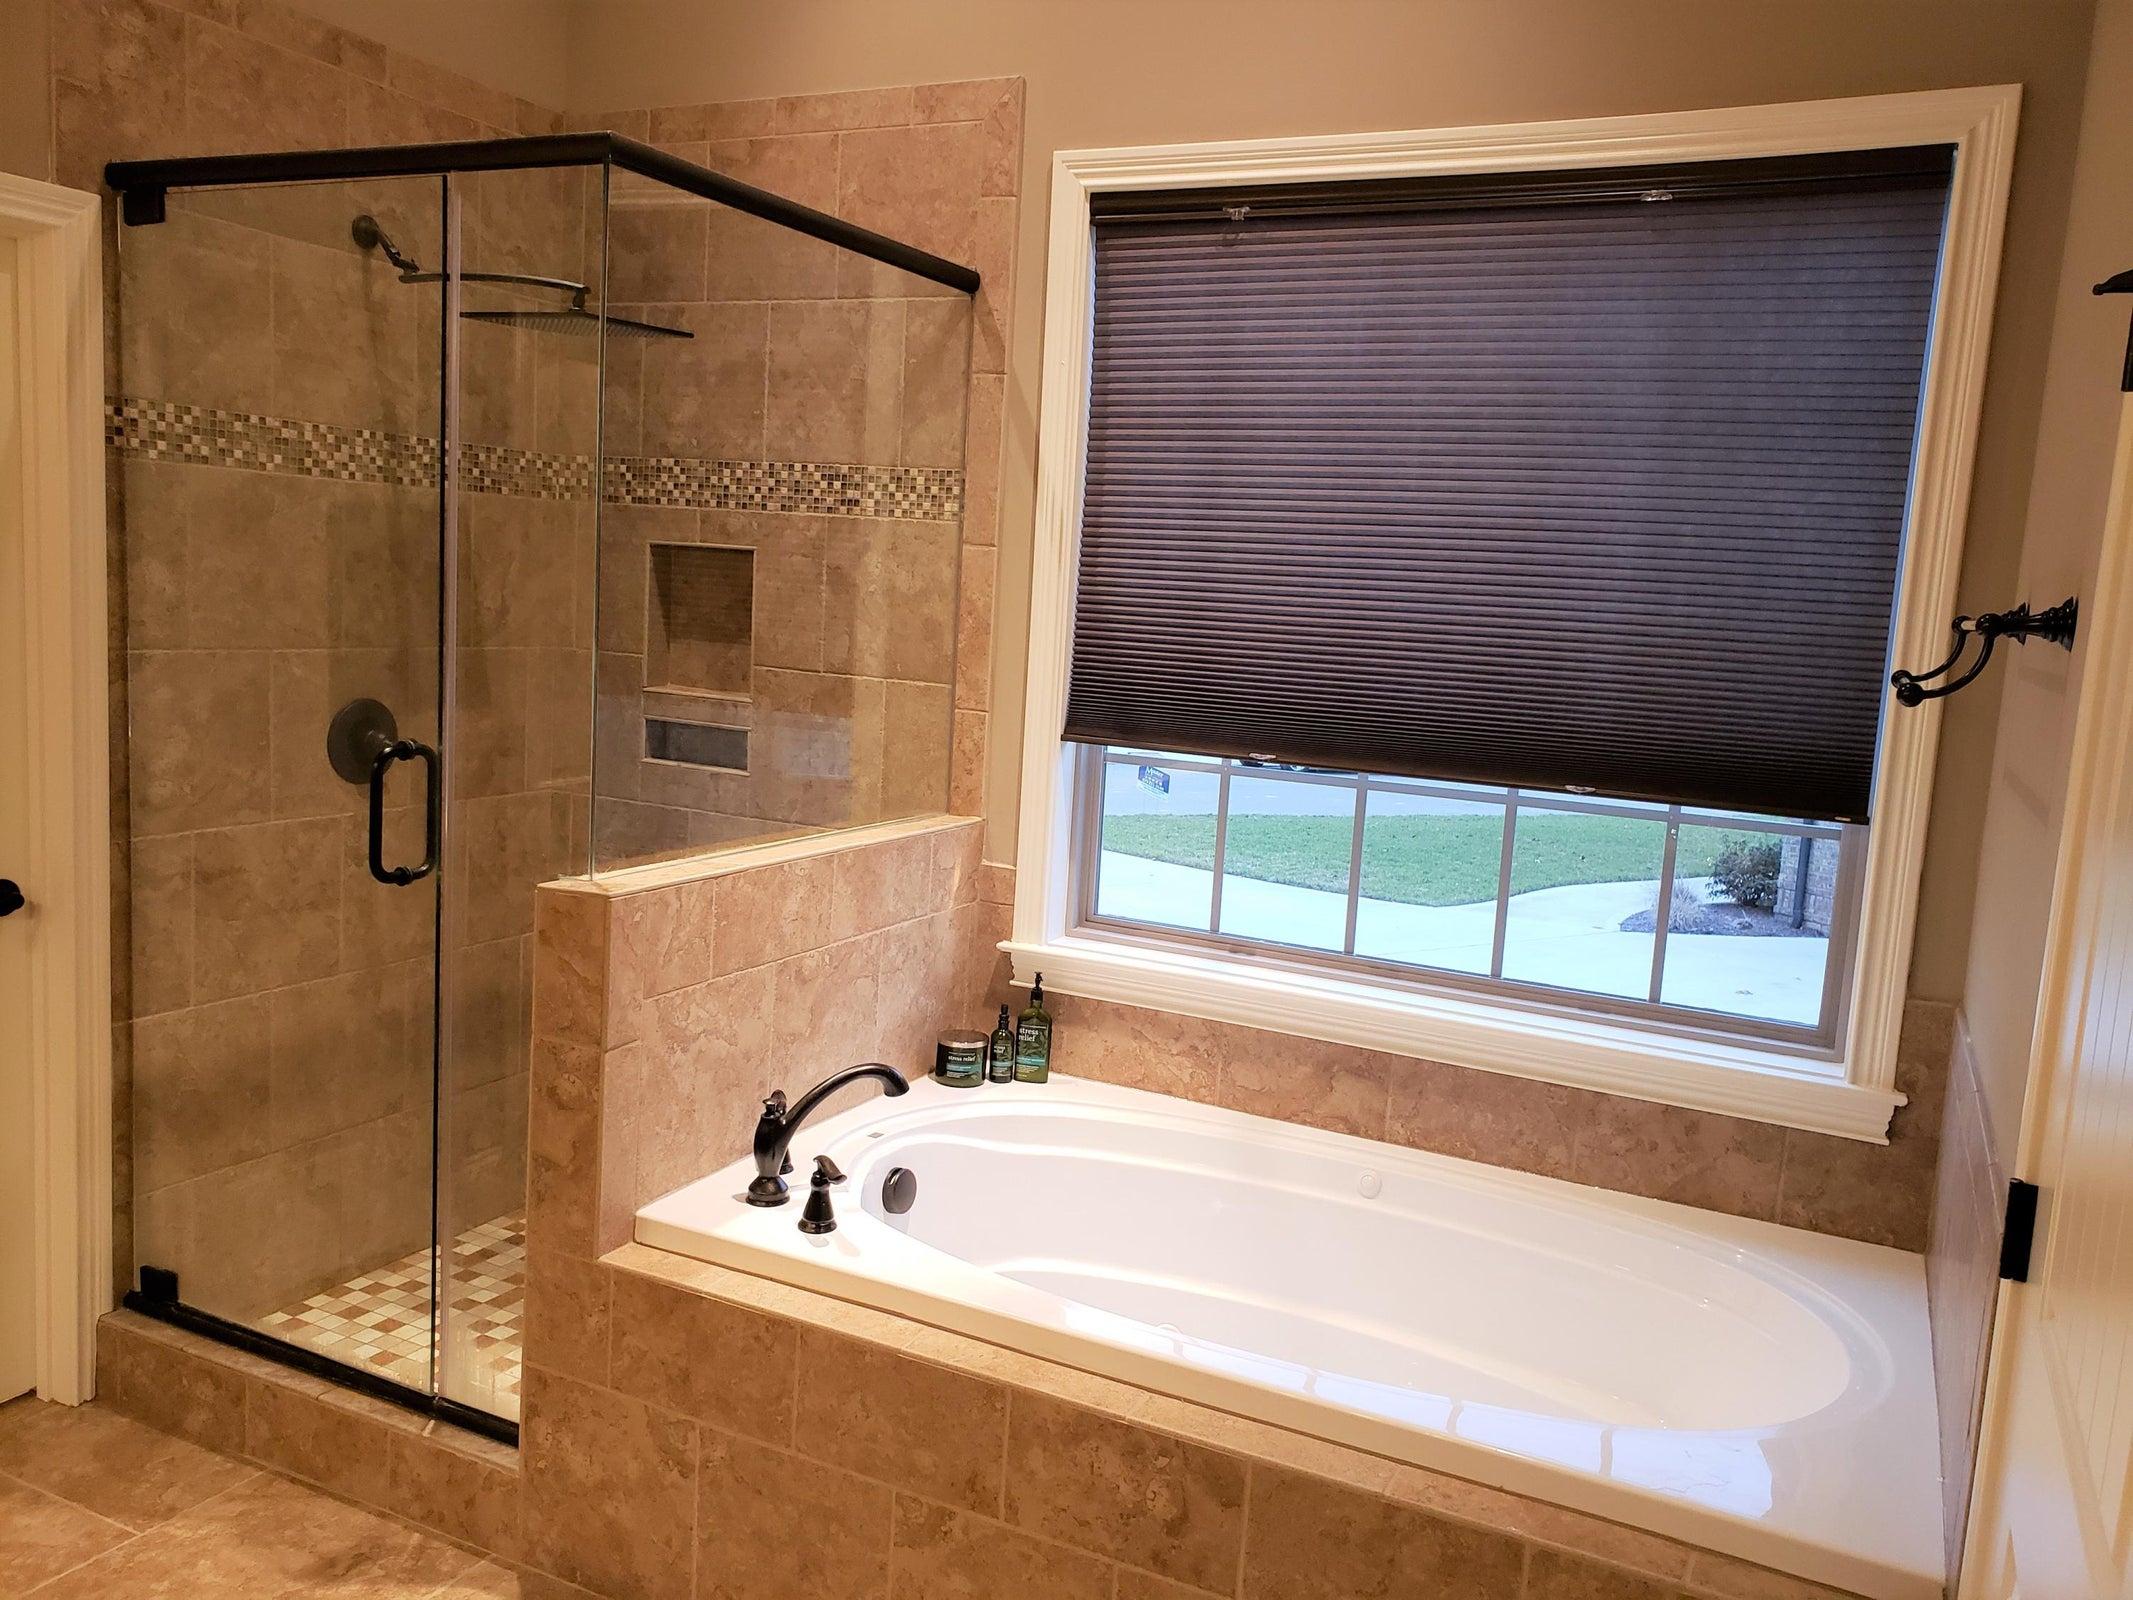 wendy siman - 10 master bath